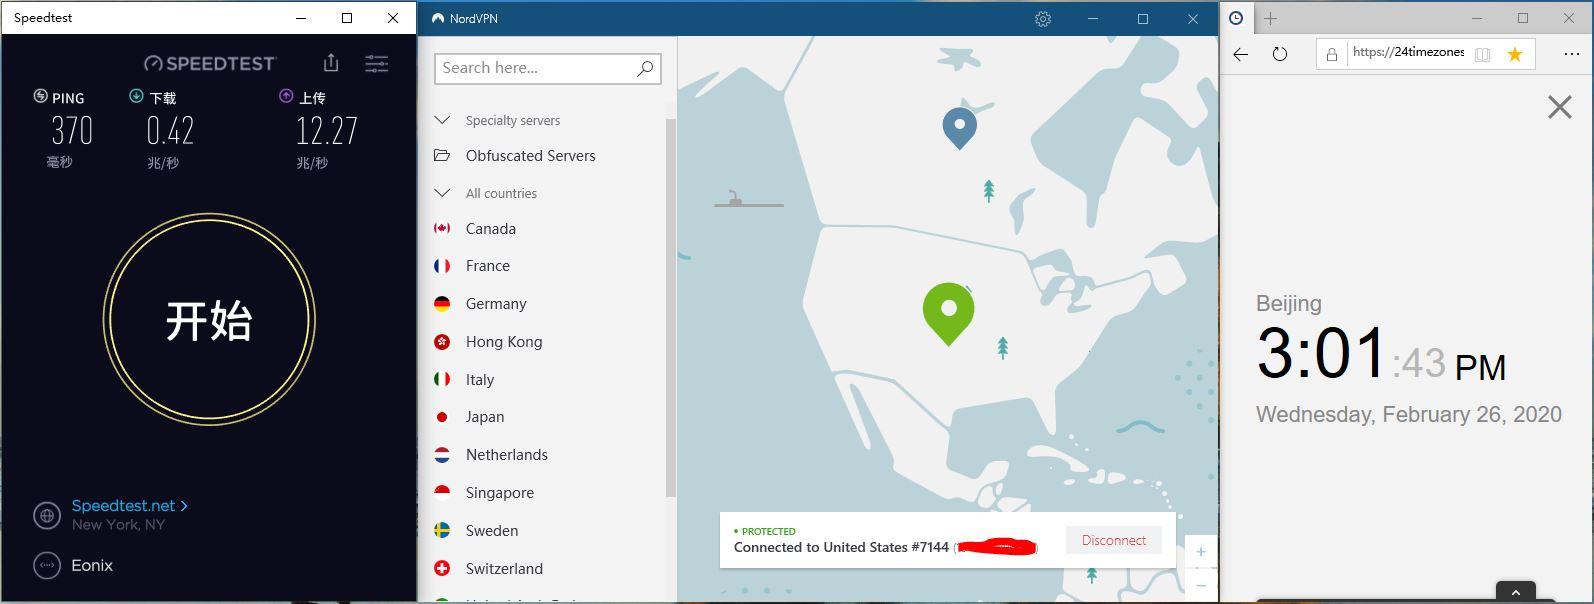 NordVPN Windows10 USA-7144 中国VPN翻墙 科学上网 Youtube测速-20200226